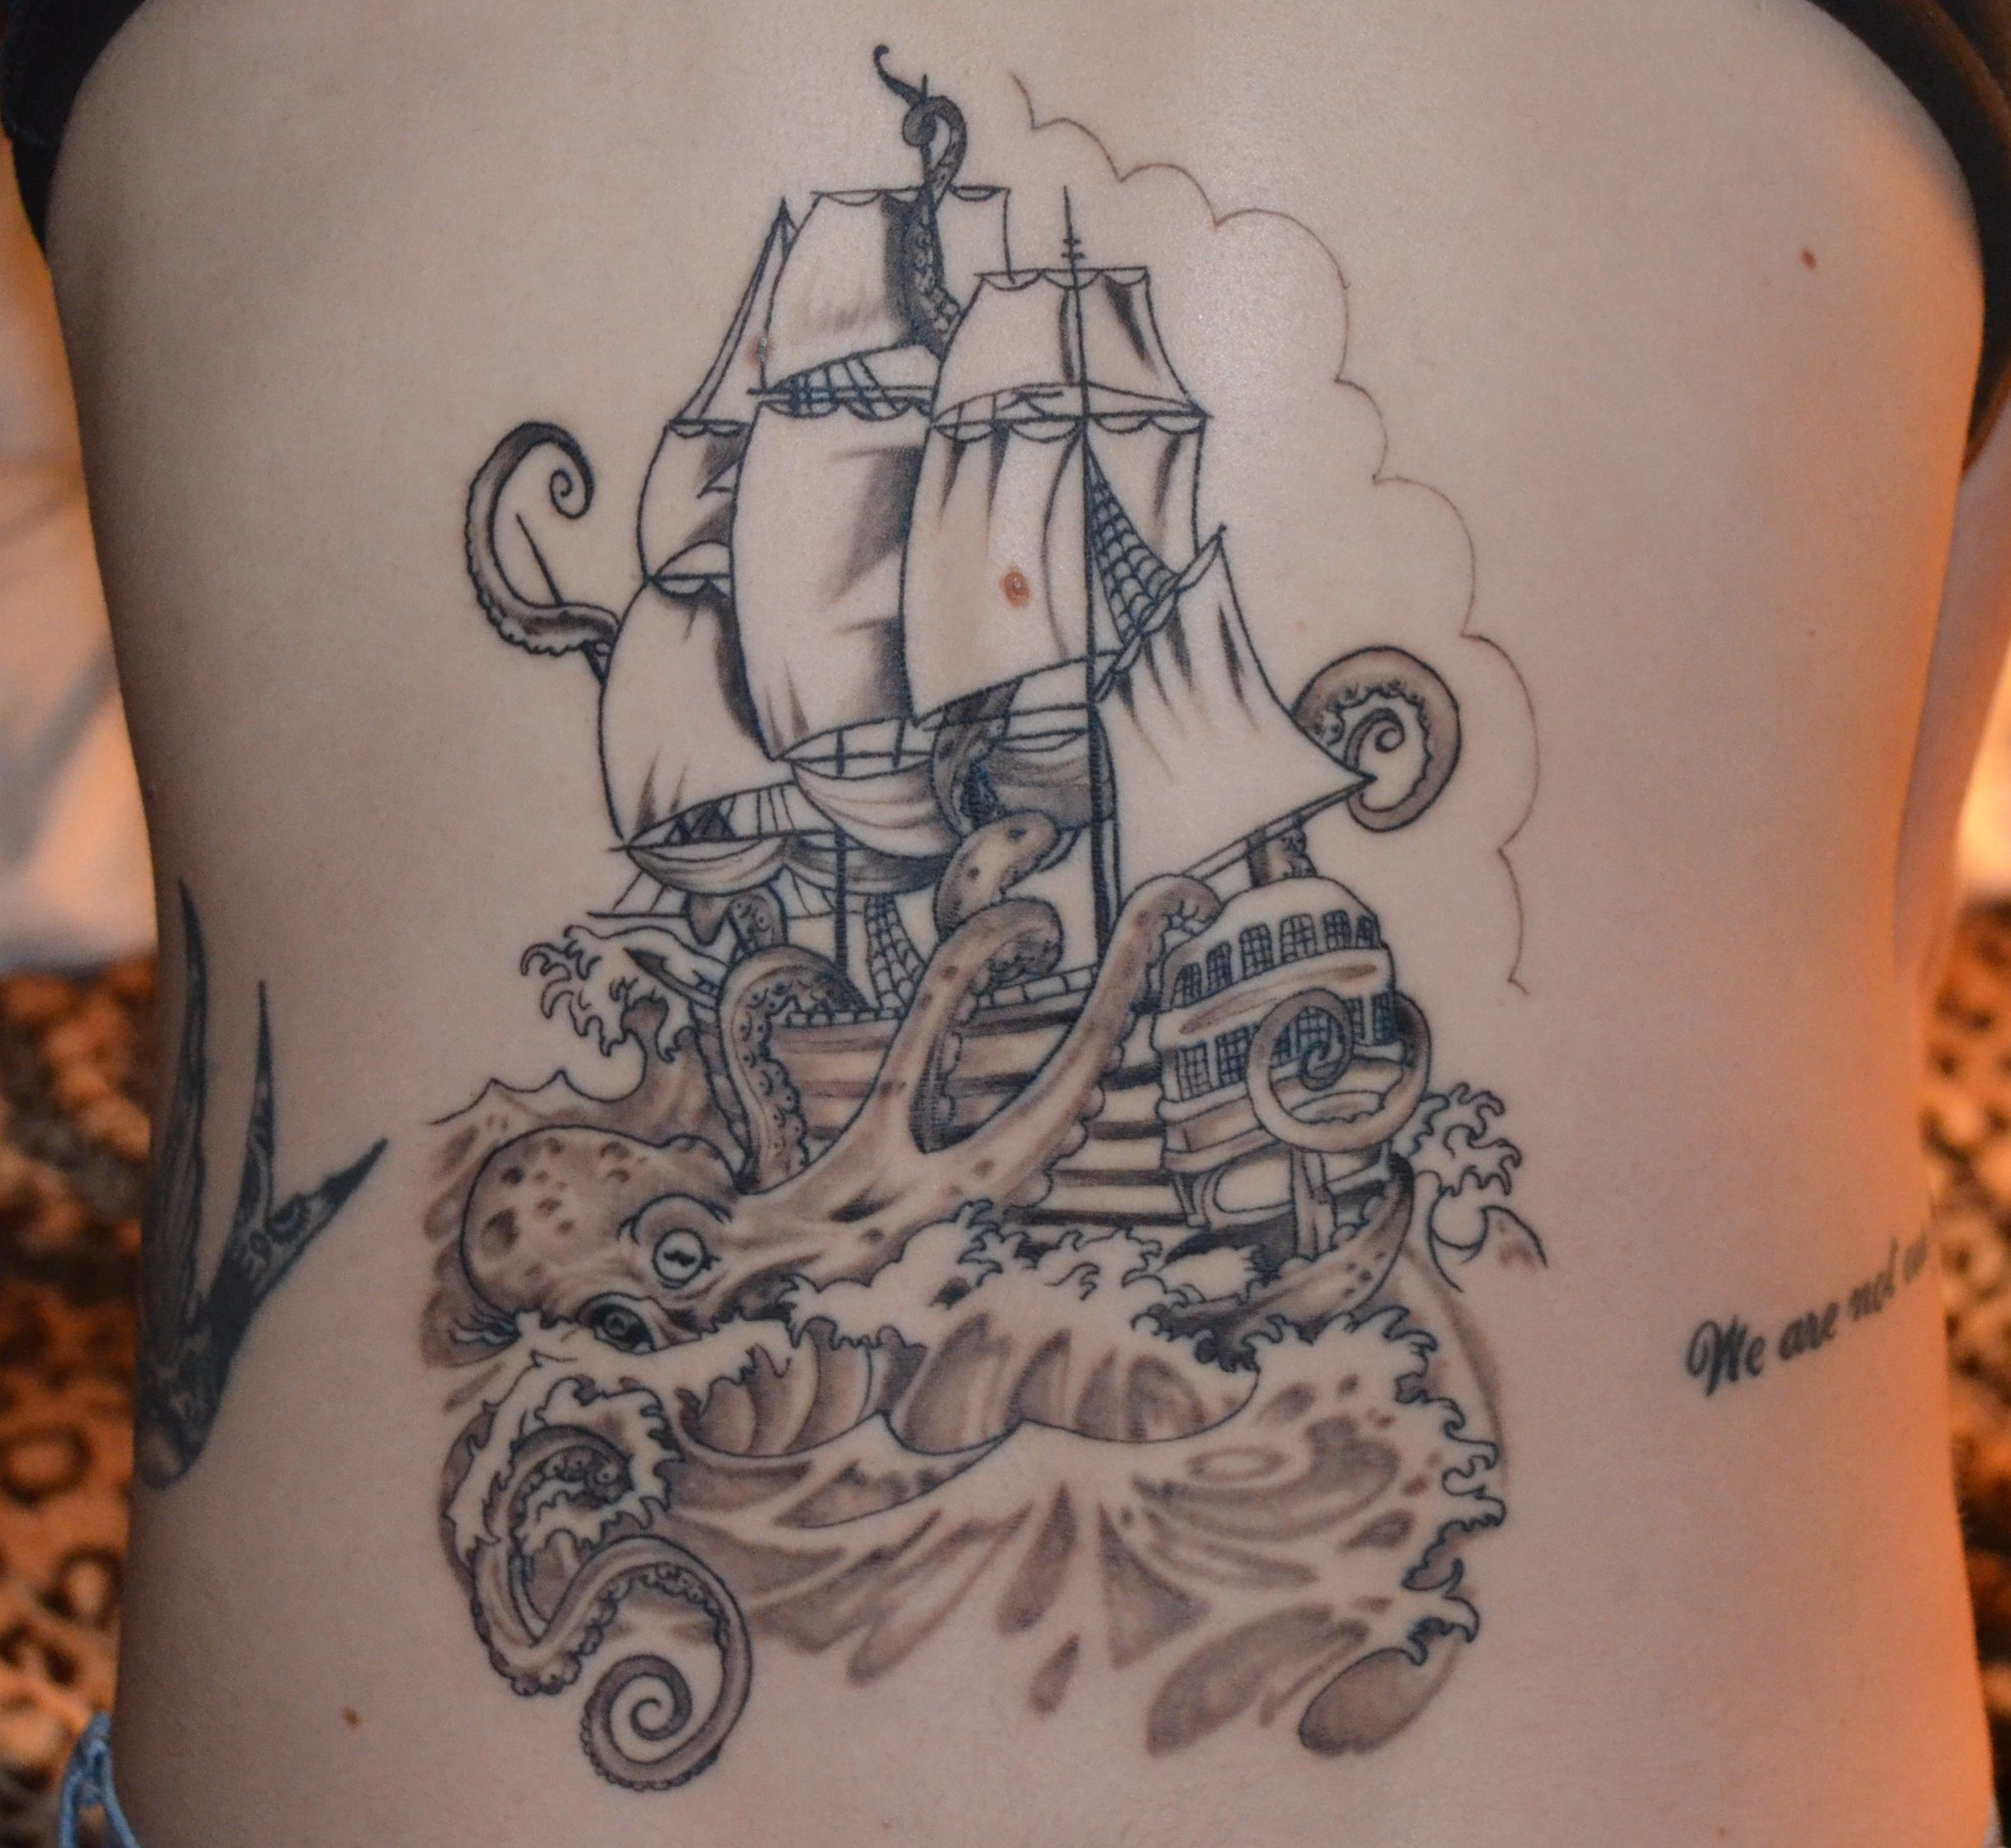 Octopus pirate ship!